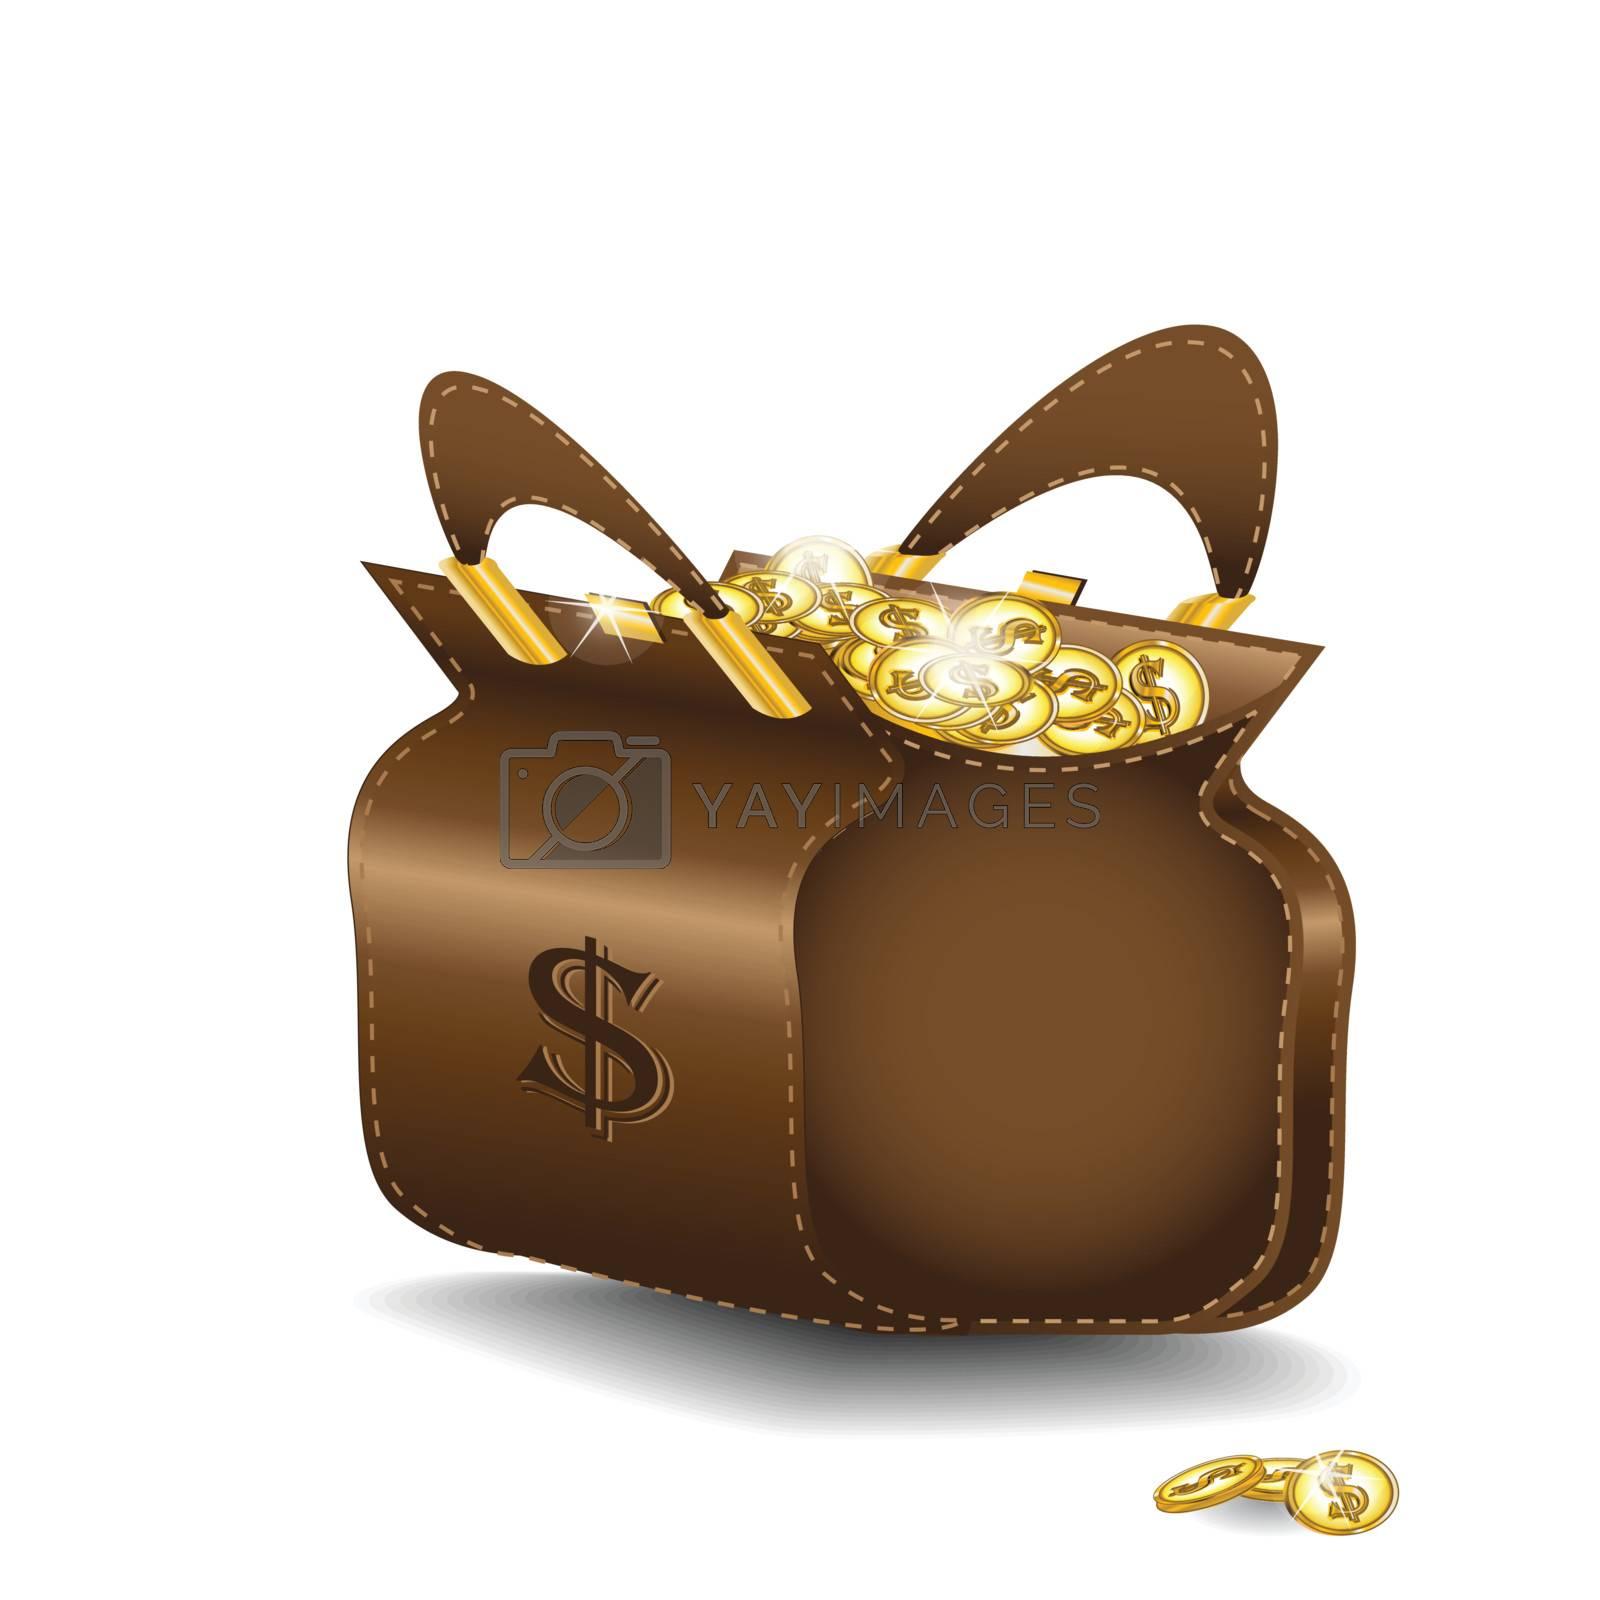 illustration, traveling bag with golden brilliant coin